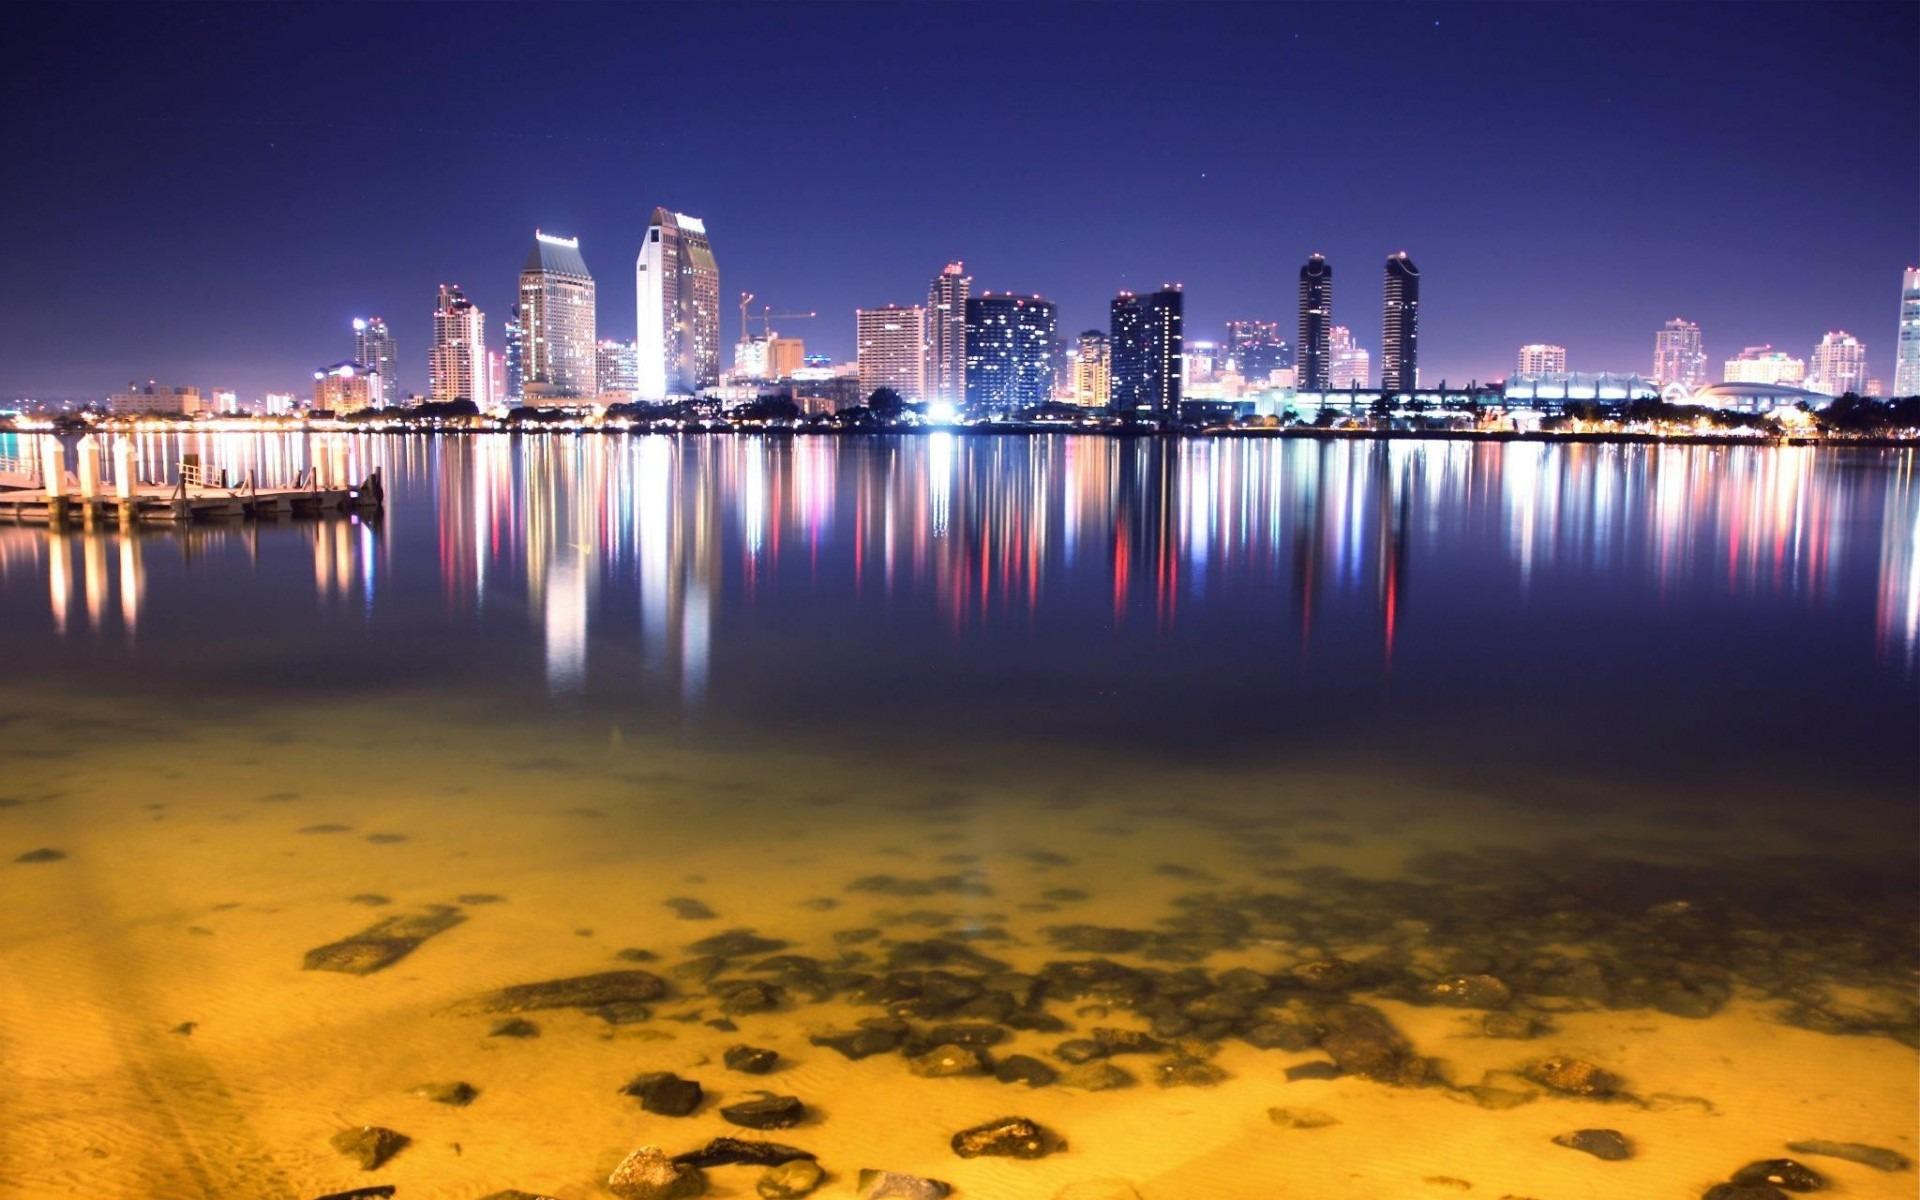 San Diego Skyline Cities Hd Wallpaper Preview 10wallpaper Com